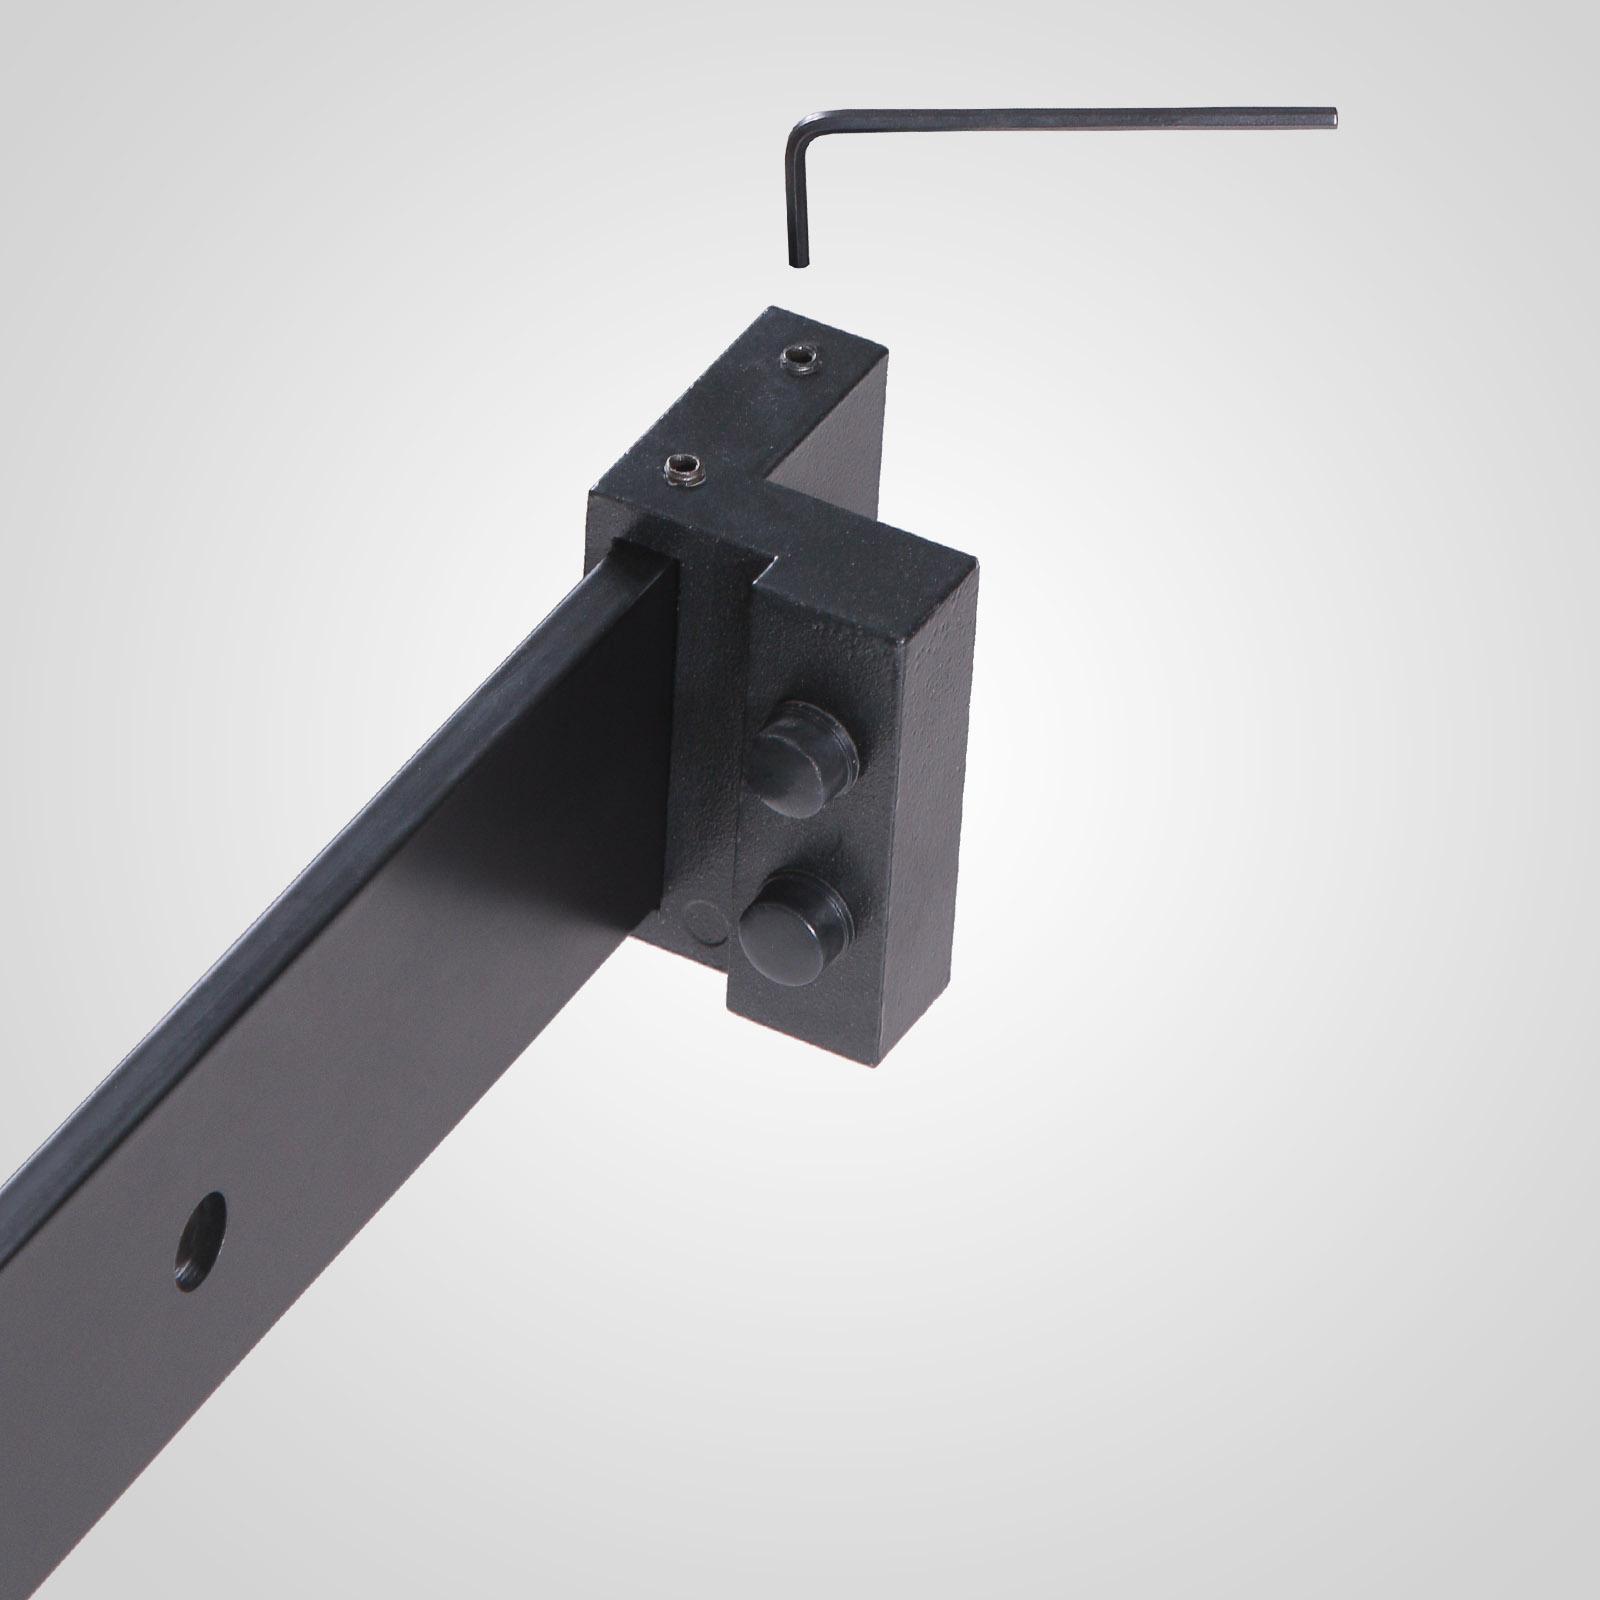 Wall mount sliding door hardware in white - Black Carbon Steel Sliding Barn Door Hardware Track